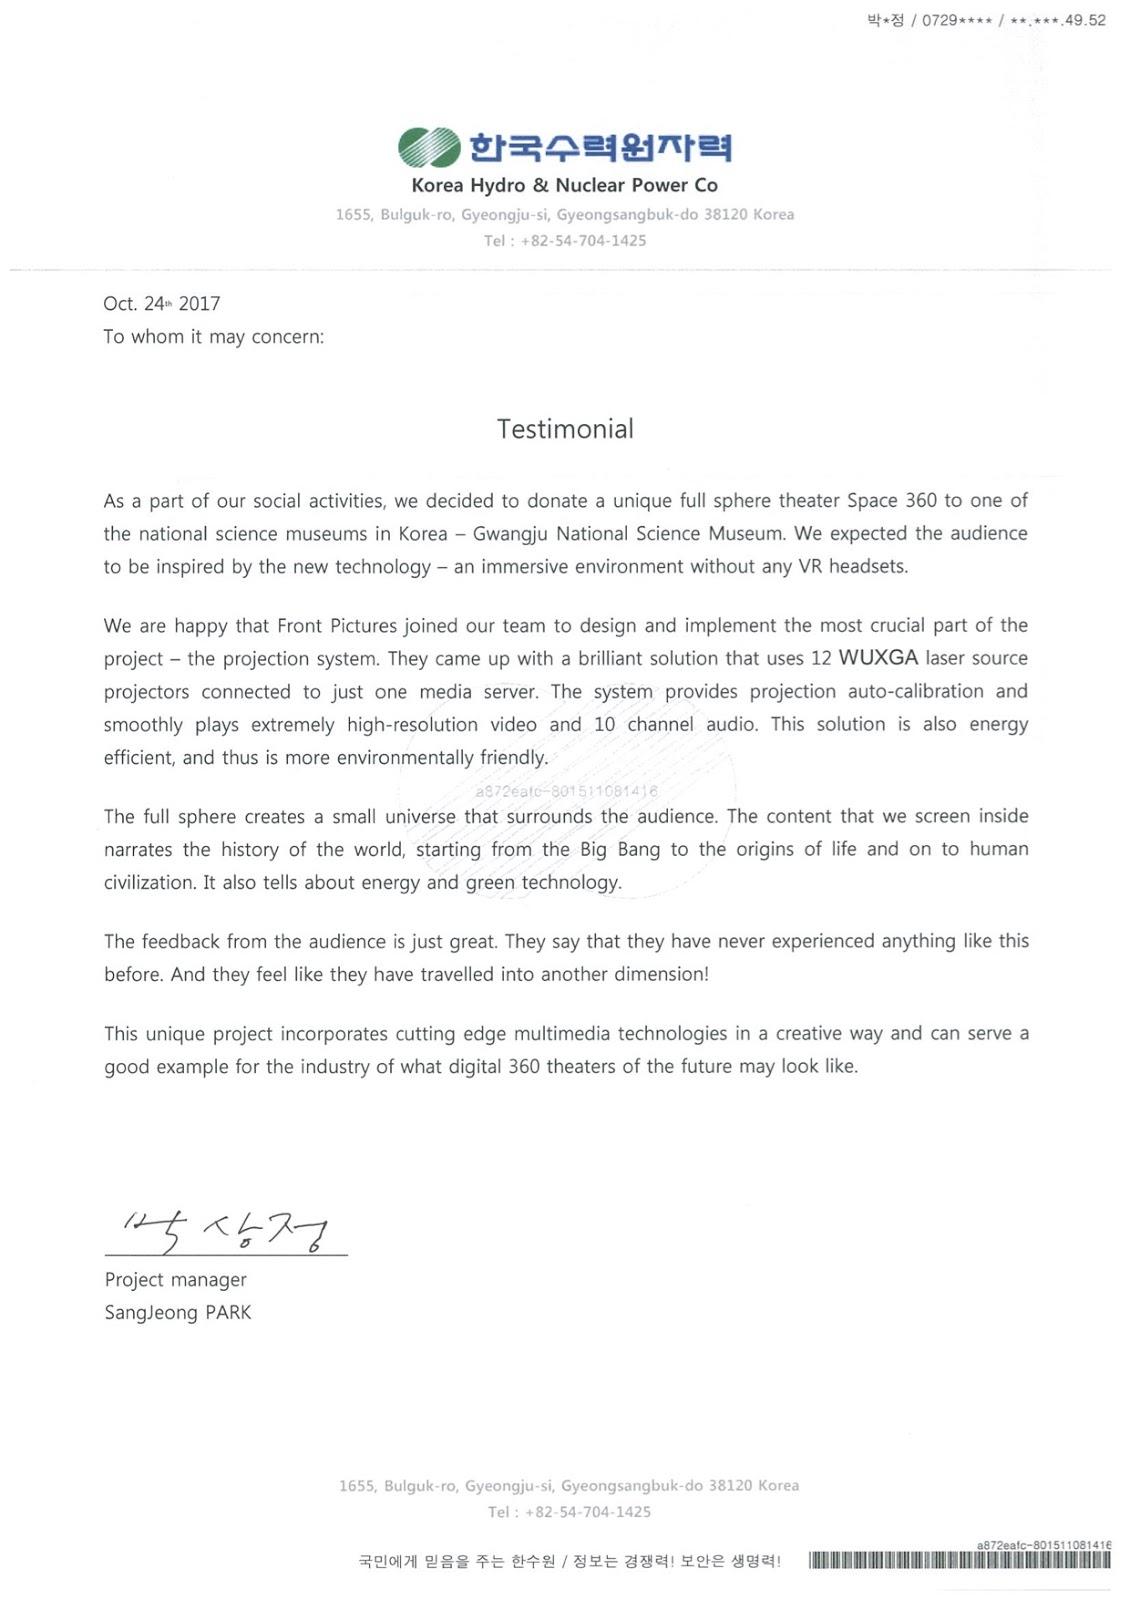 Testimonial_KHNP